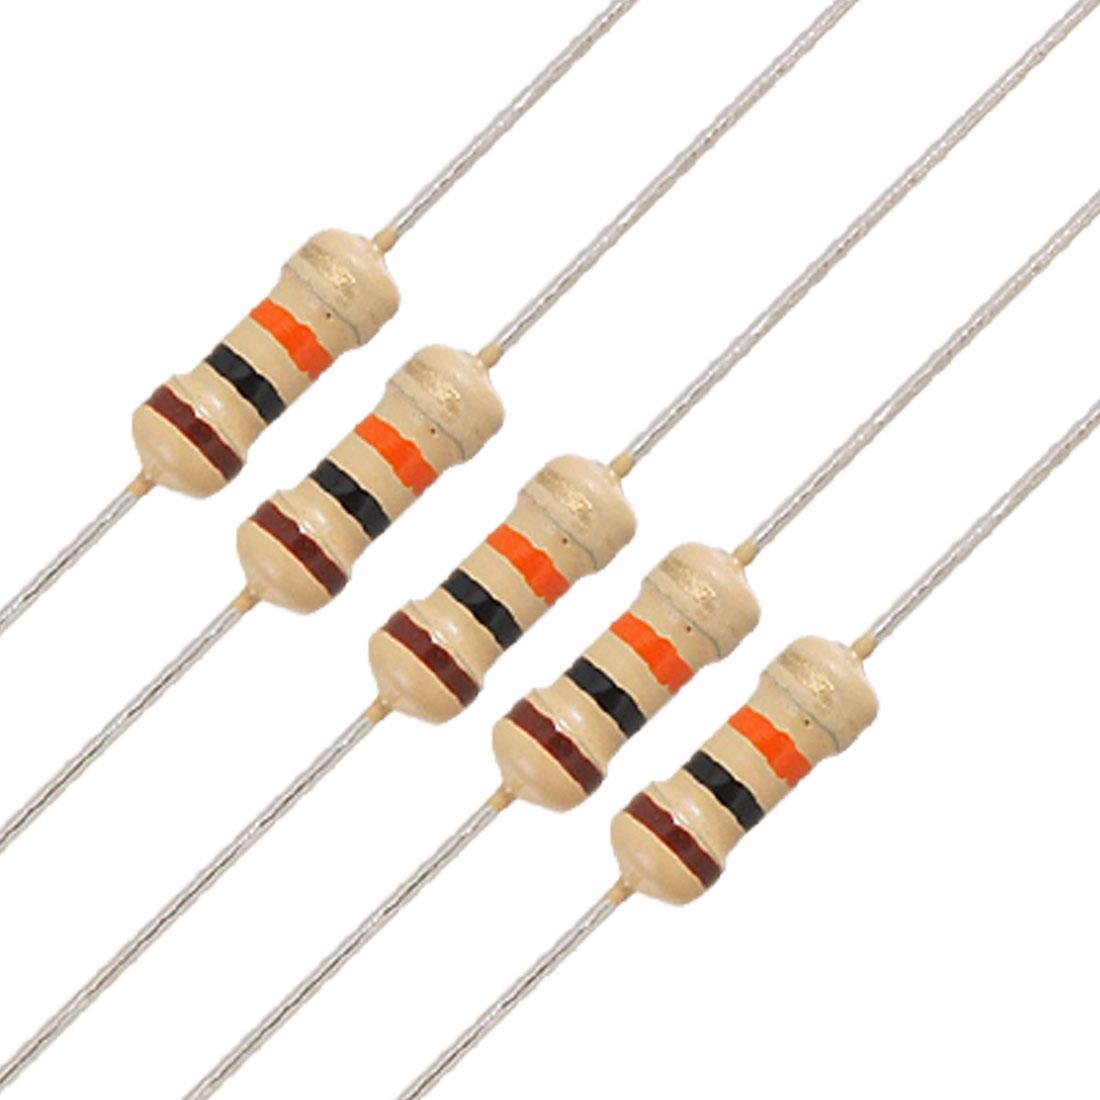 50 x 1/4W 250V 10K Ohm Axial Lead Carbon Film Resistors